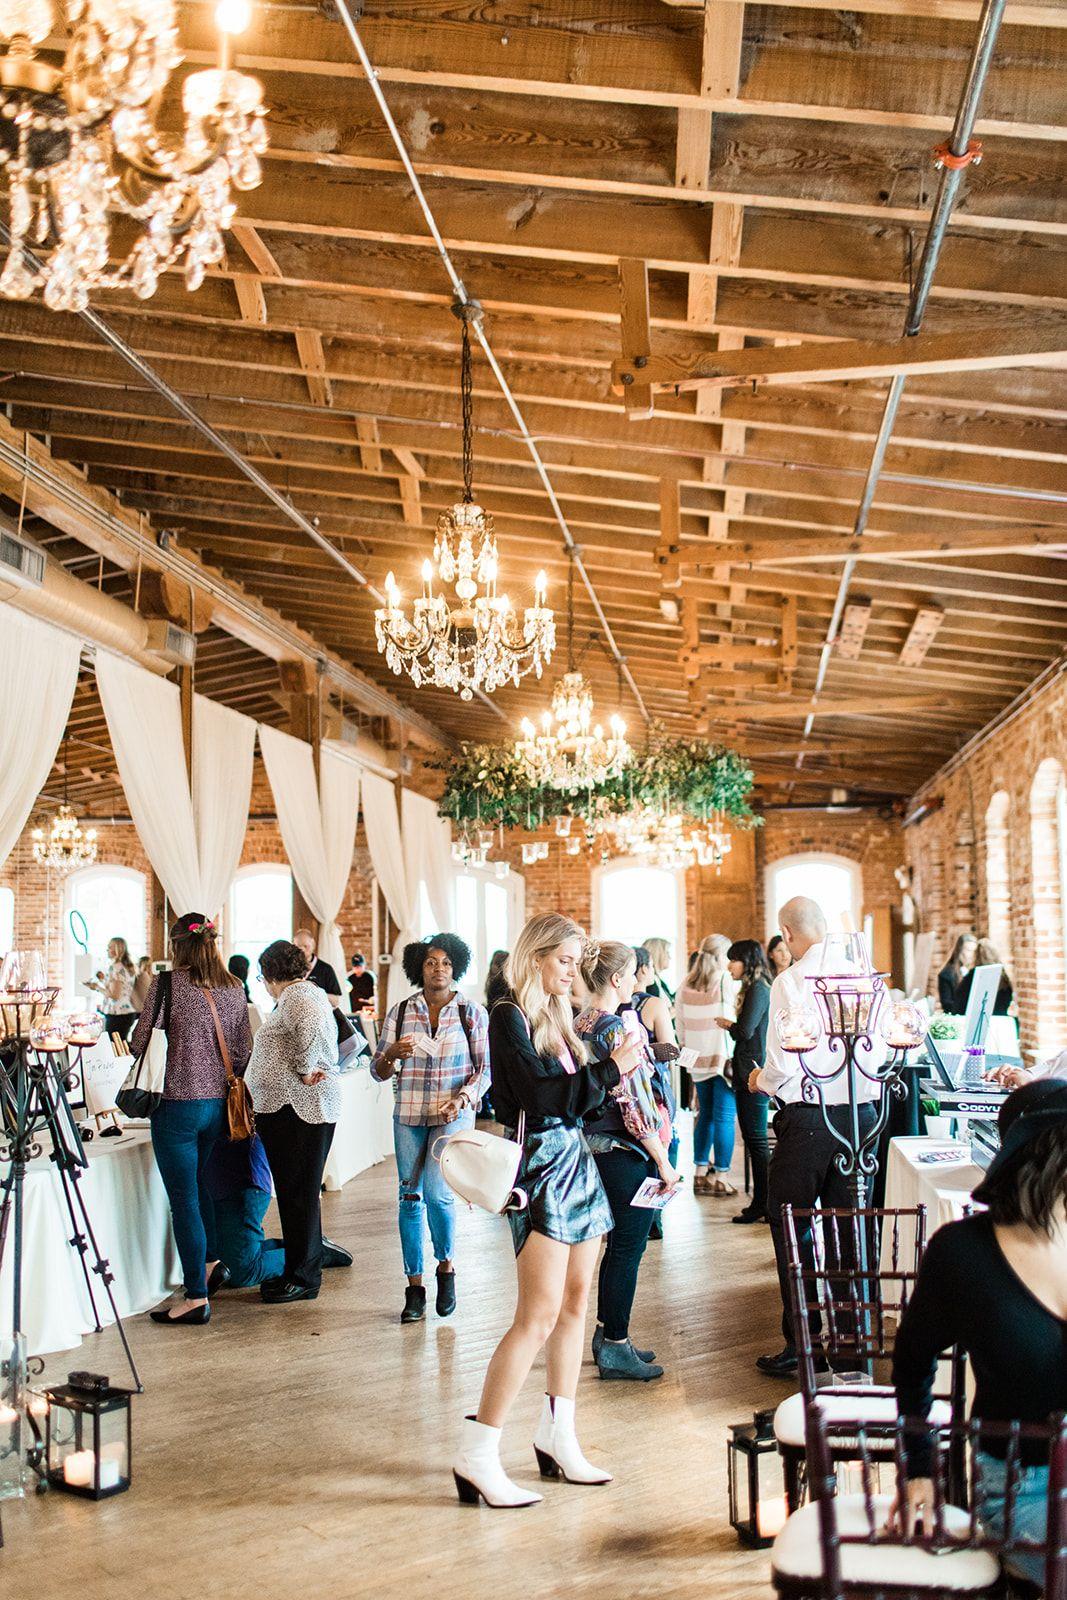 Weddings + Warehouses Tour at Melrose Knitting Mill